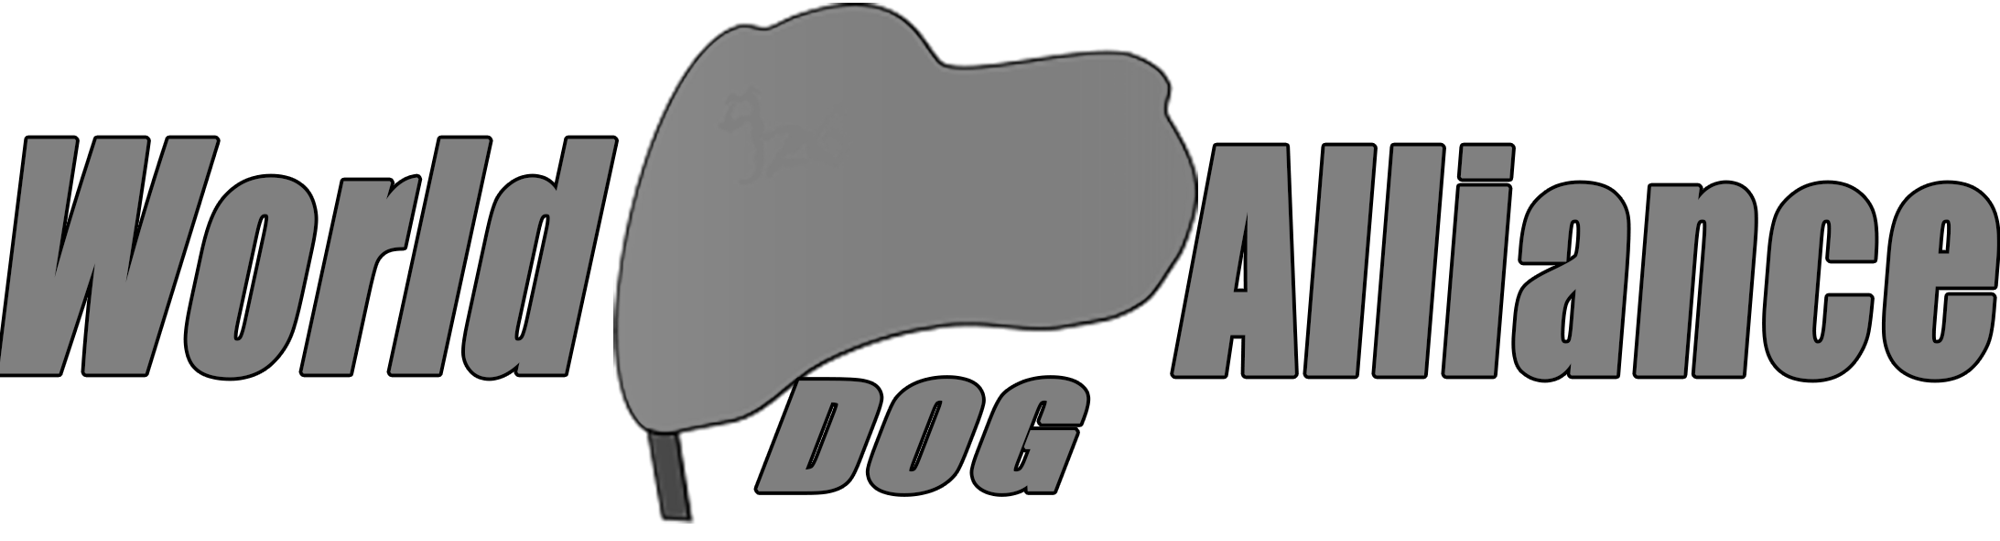 WDA B&W logo.png